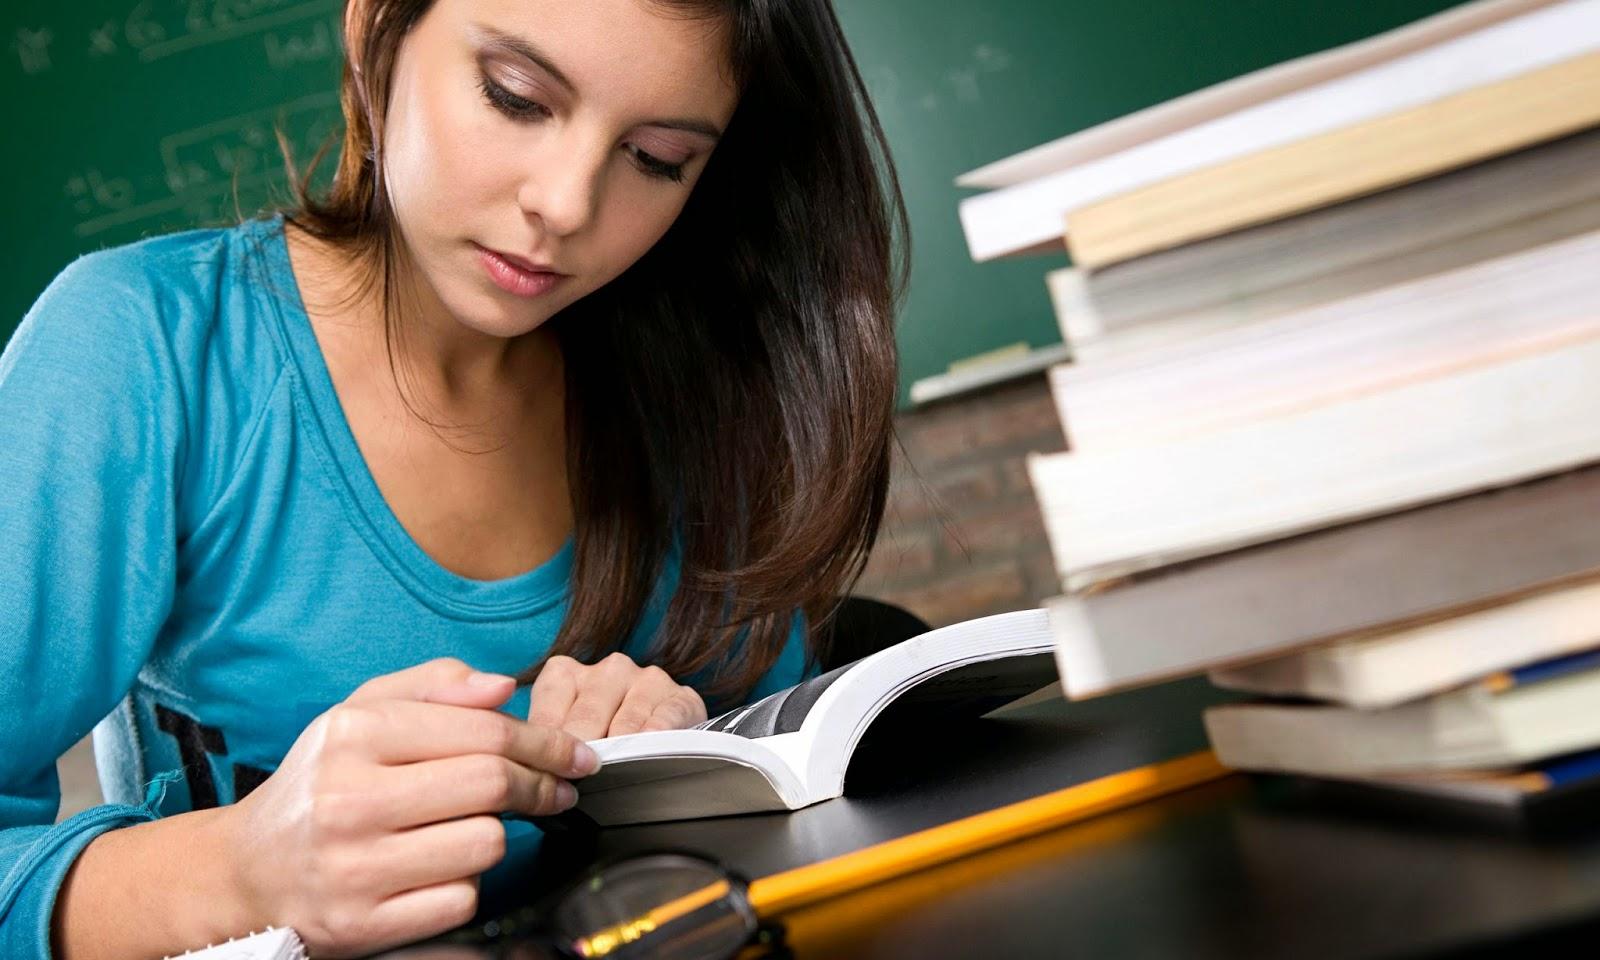 PLEASE HELP! How do I study for my physics exam?